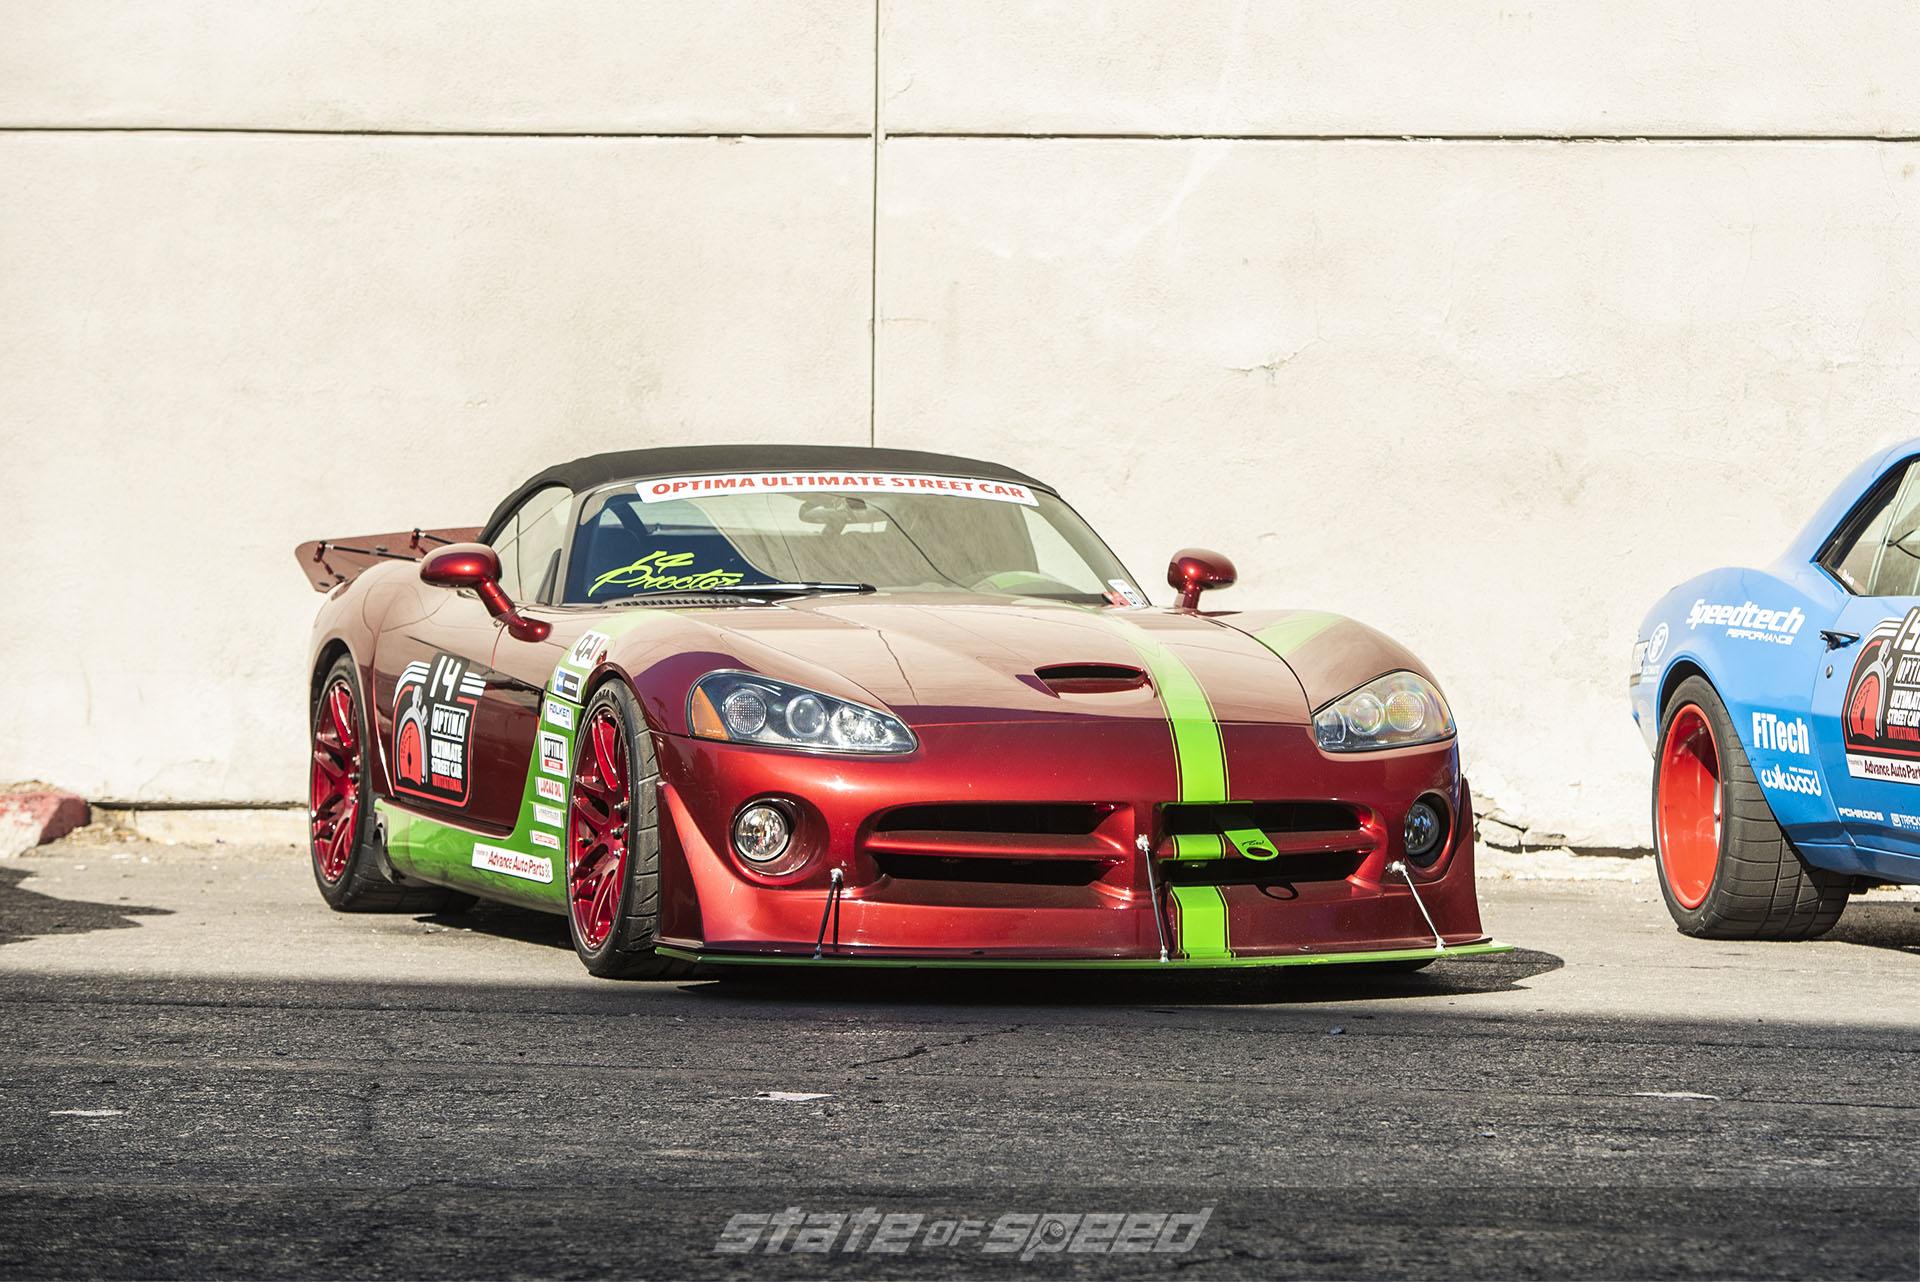 Race tuned Dodge Viper for Optima Ultimate Street Car